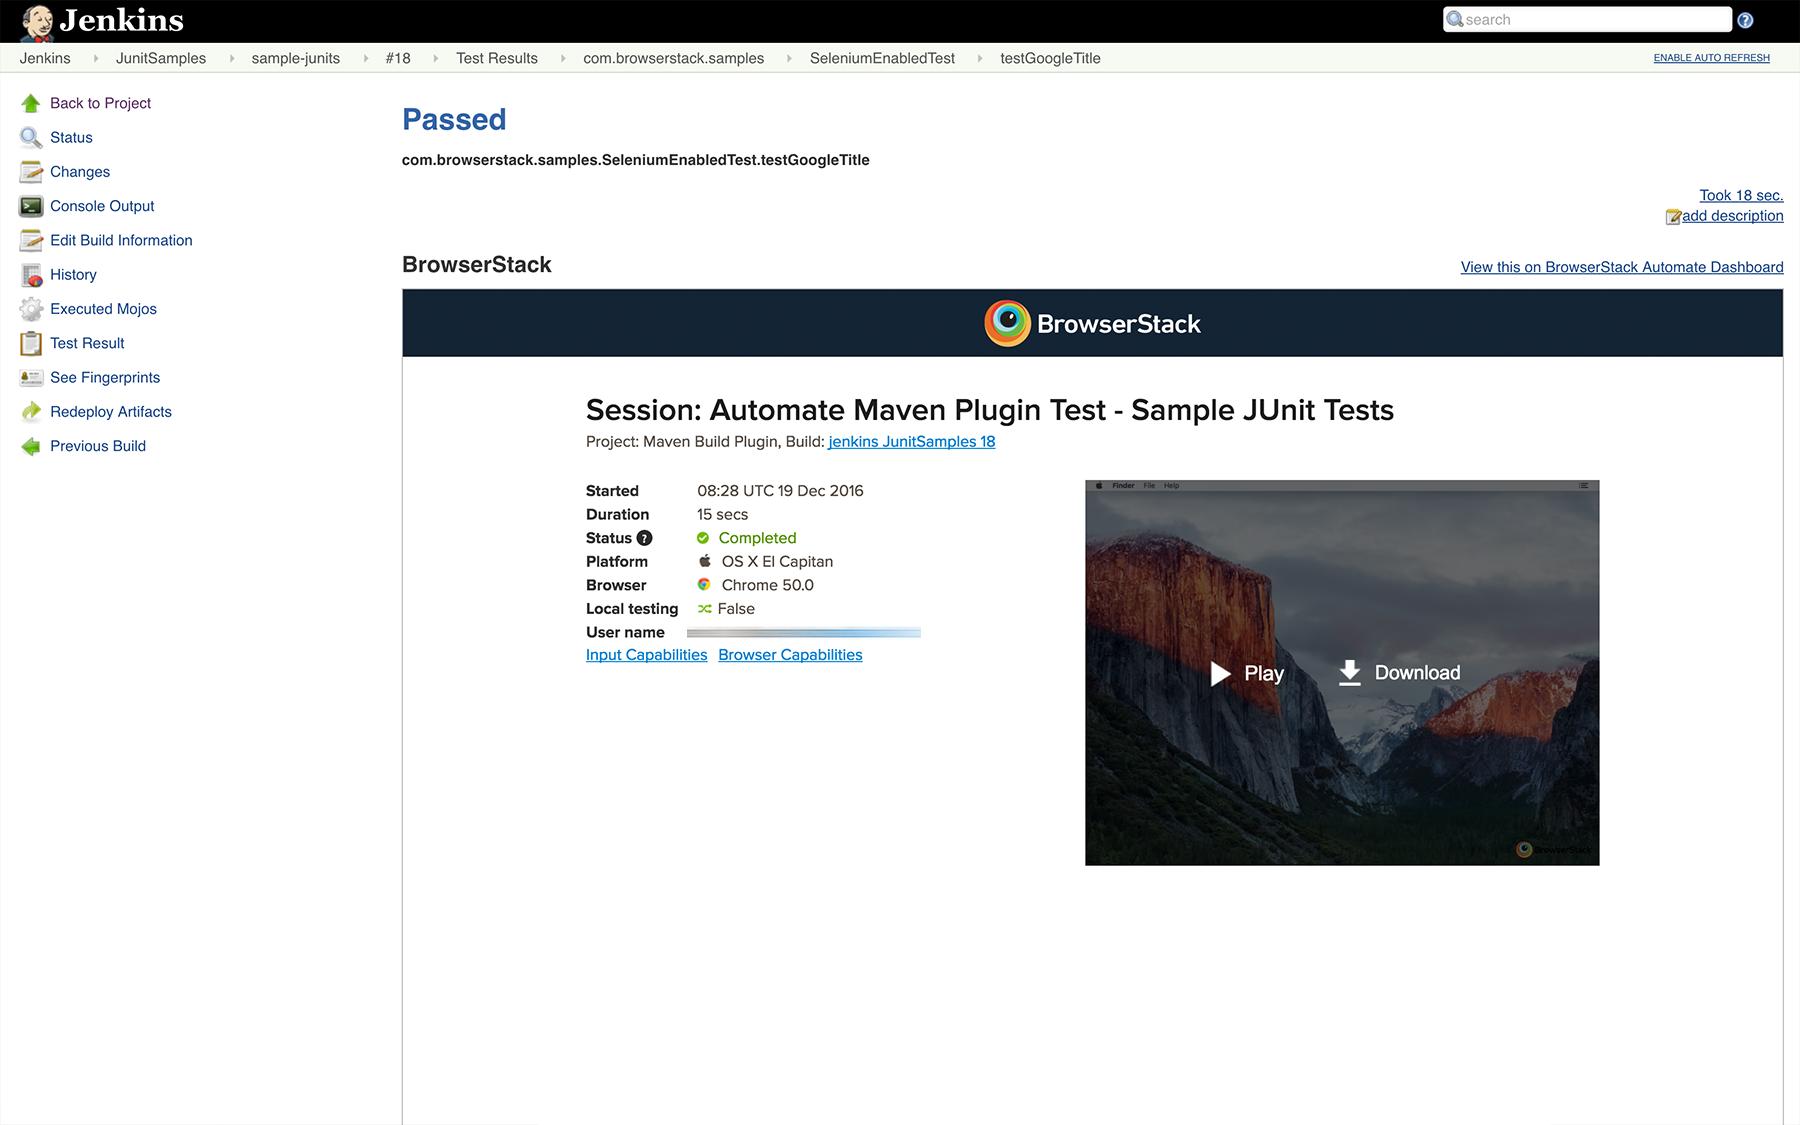 protractor-browserstack-reporter - npm